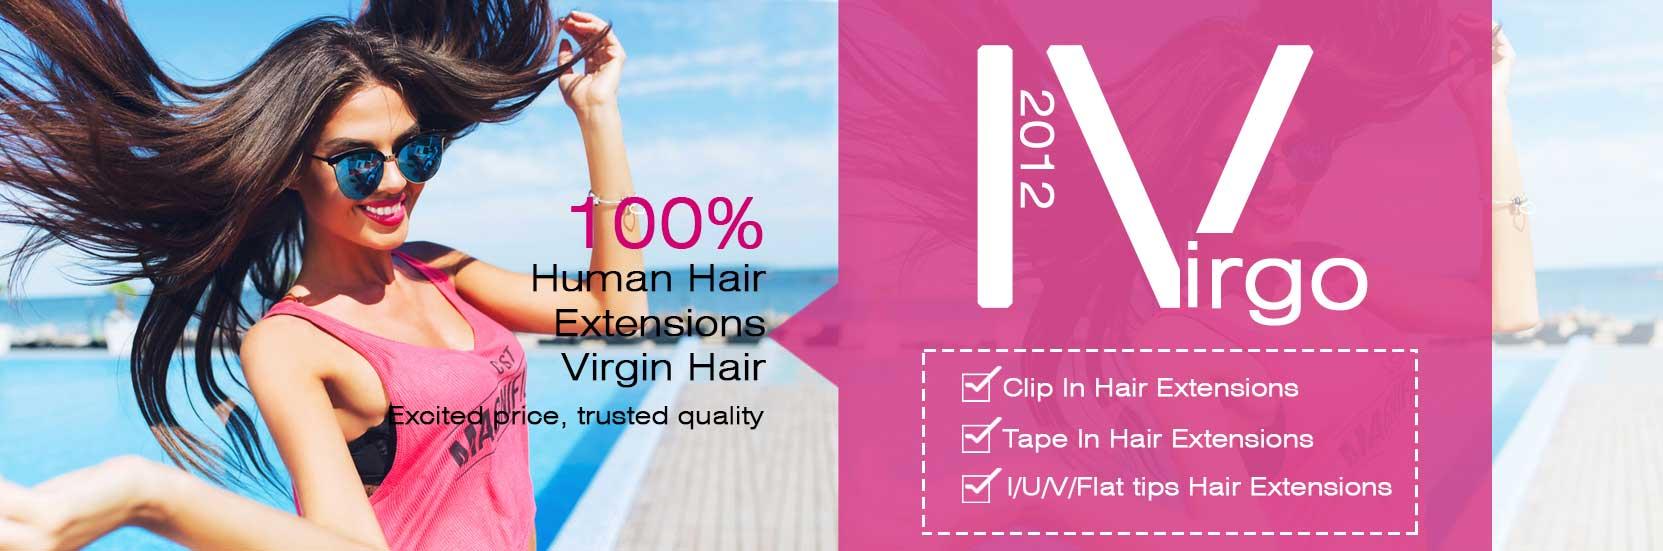 ivirgo-hair